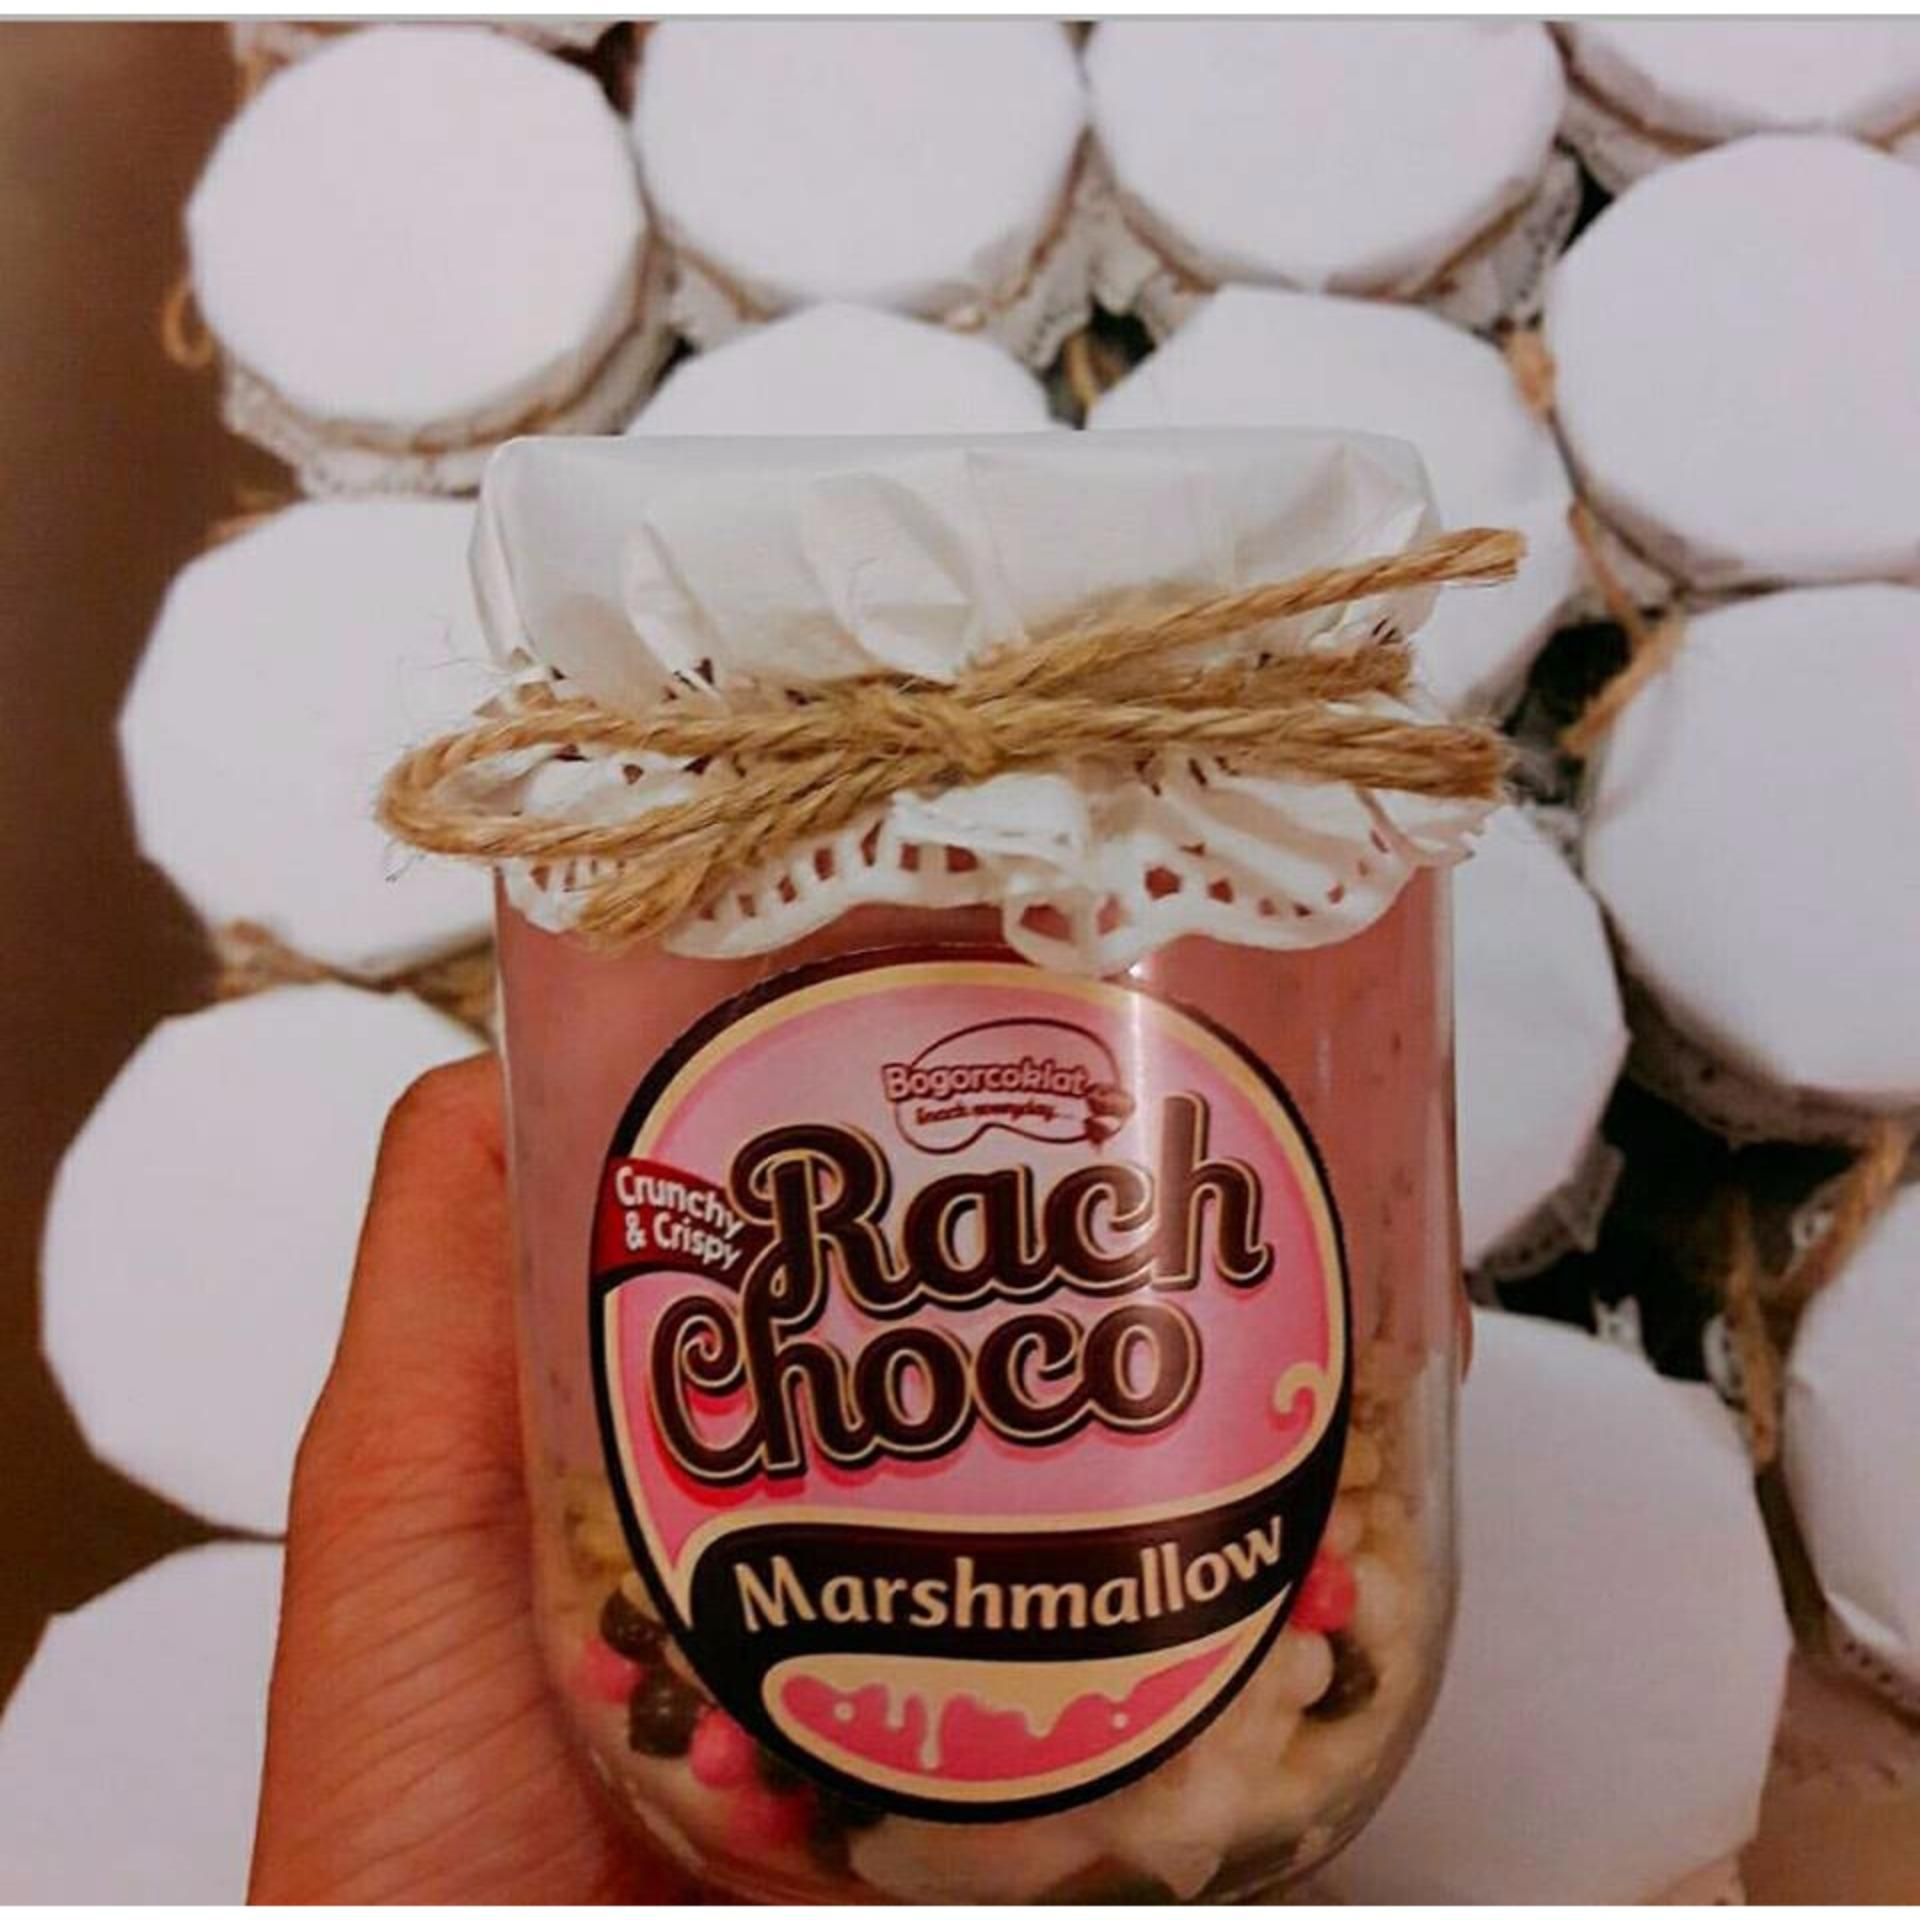 Homemade by Bogor Coklat-Rach Choco Strawberry Marshmallow